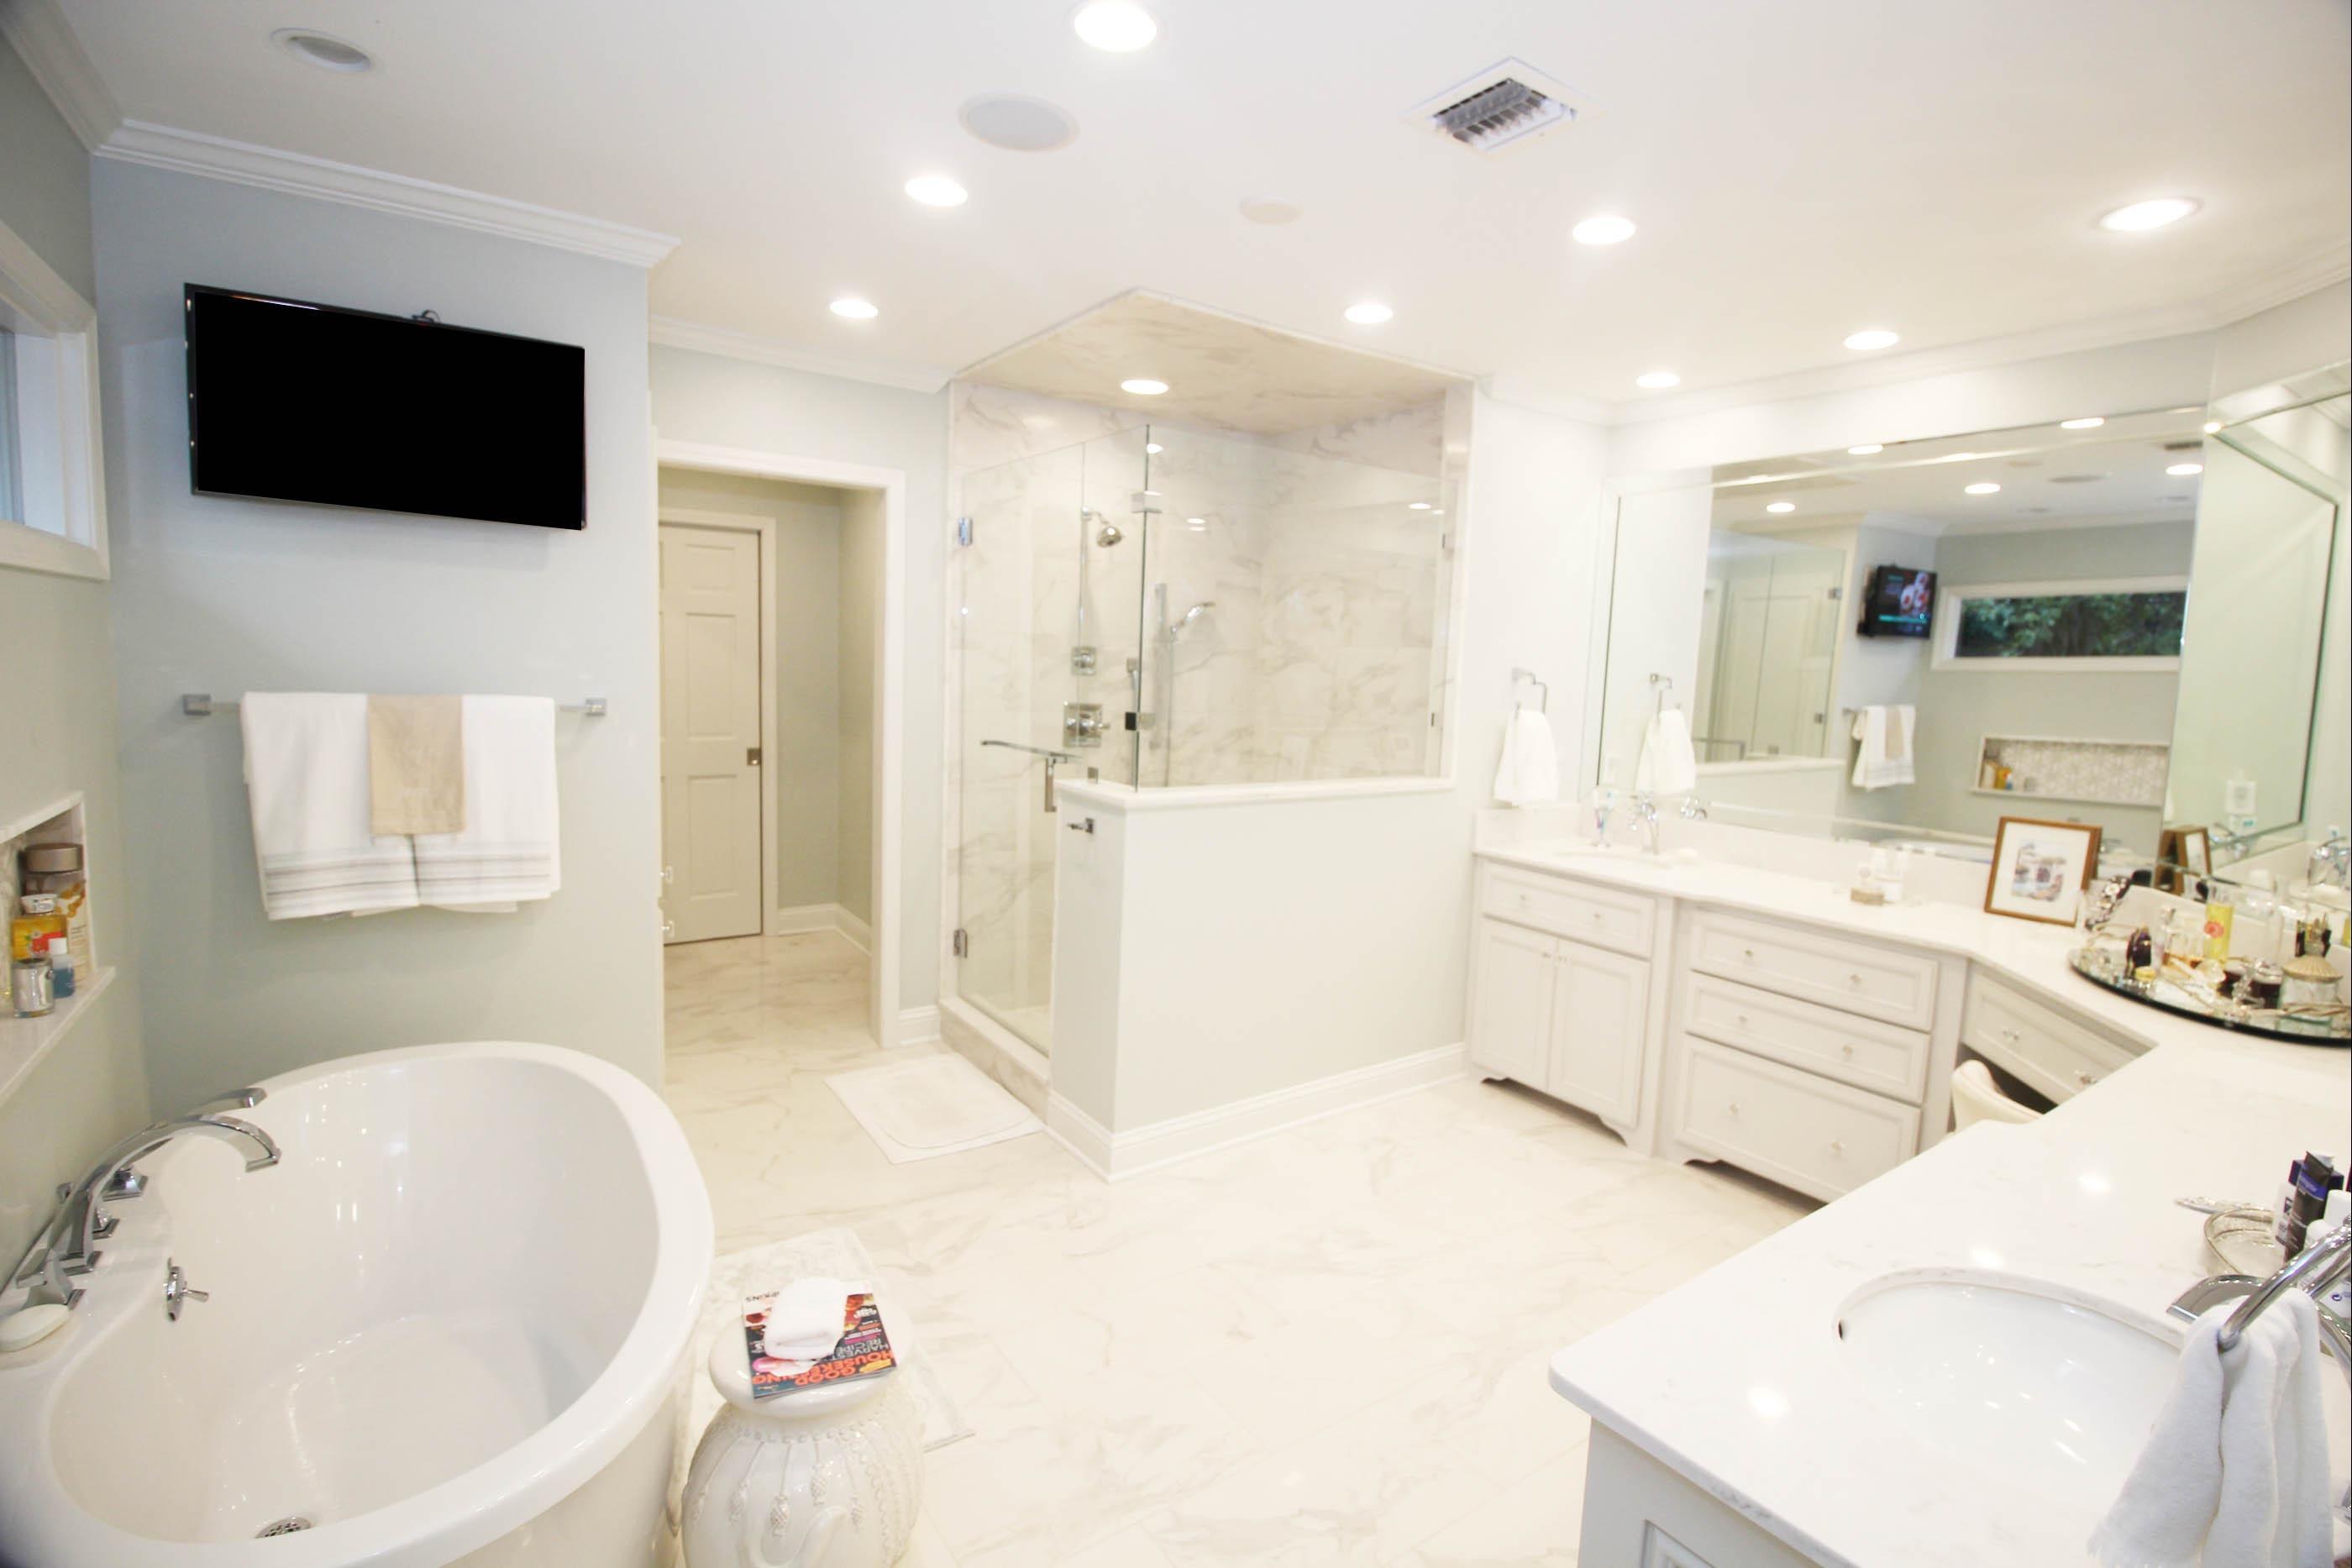 Showcase Homes & Remodeling LLC image 2